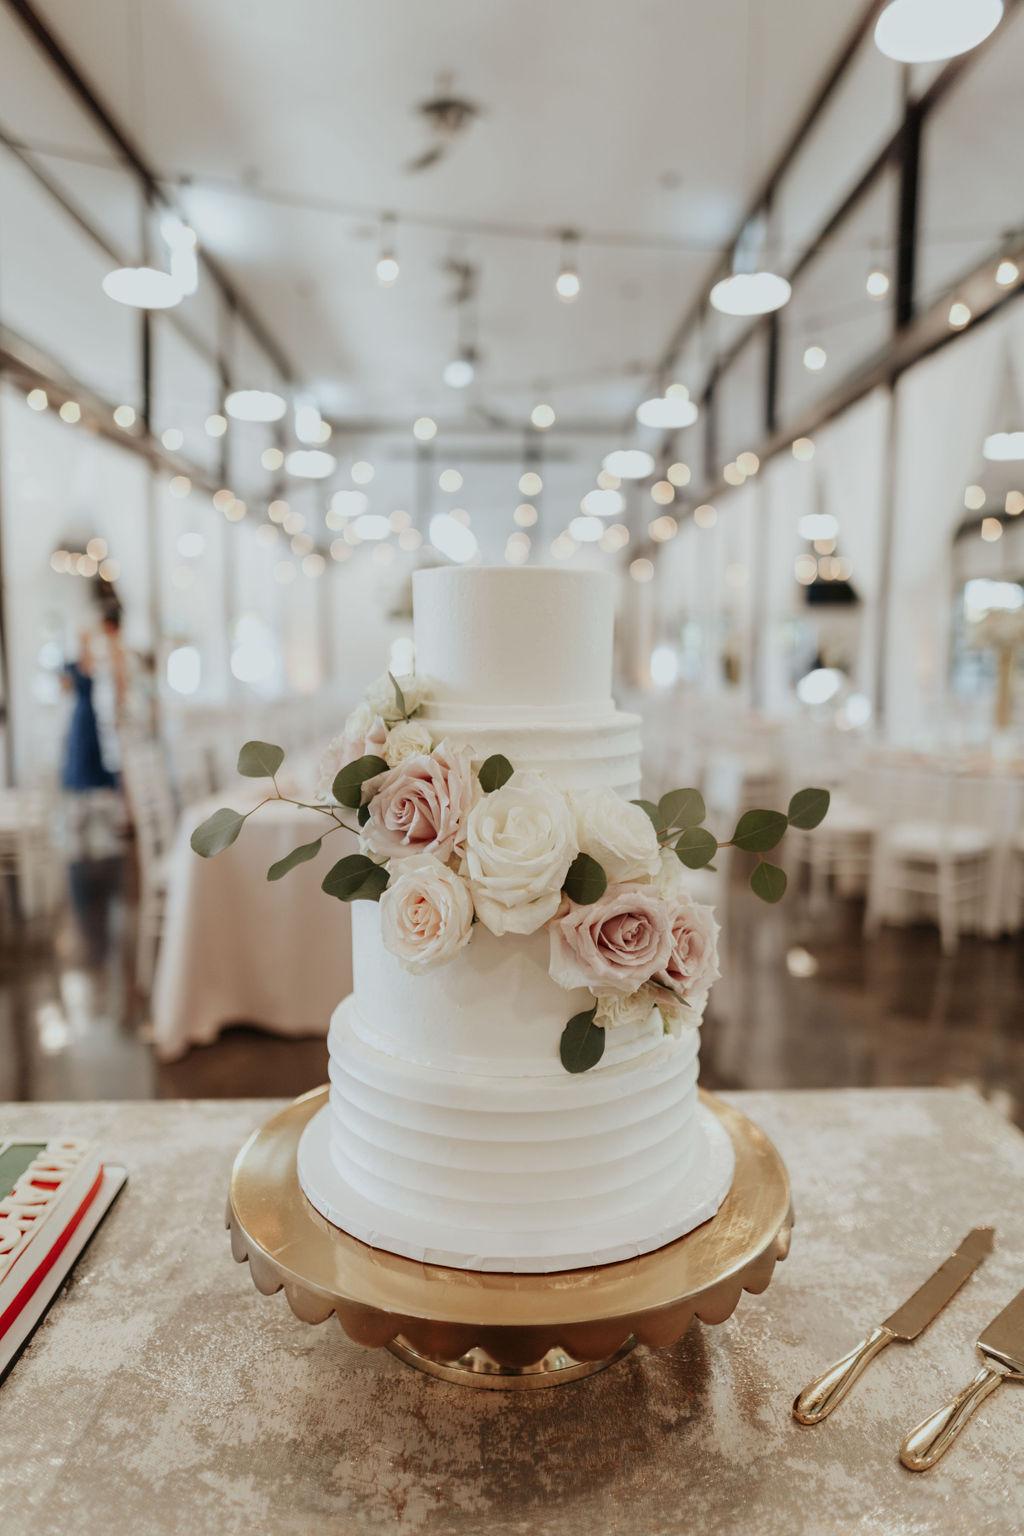 Best Oklahoma Outdoor Wedding Venue Tulsa Bixby White Barn 33.jpg